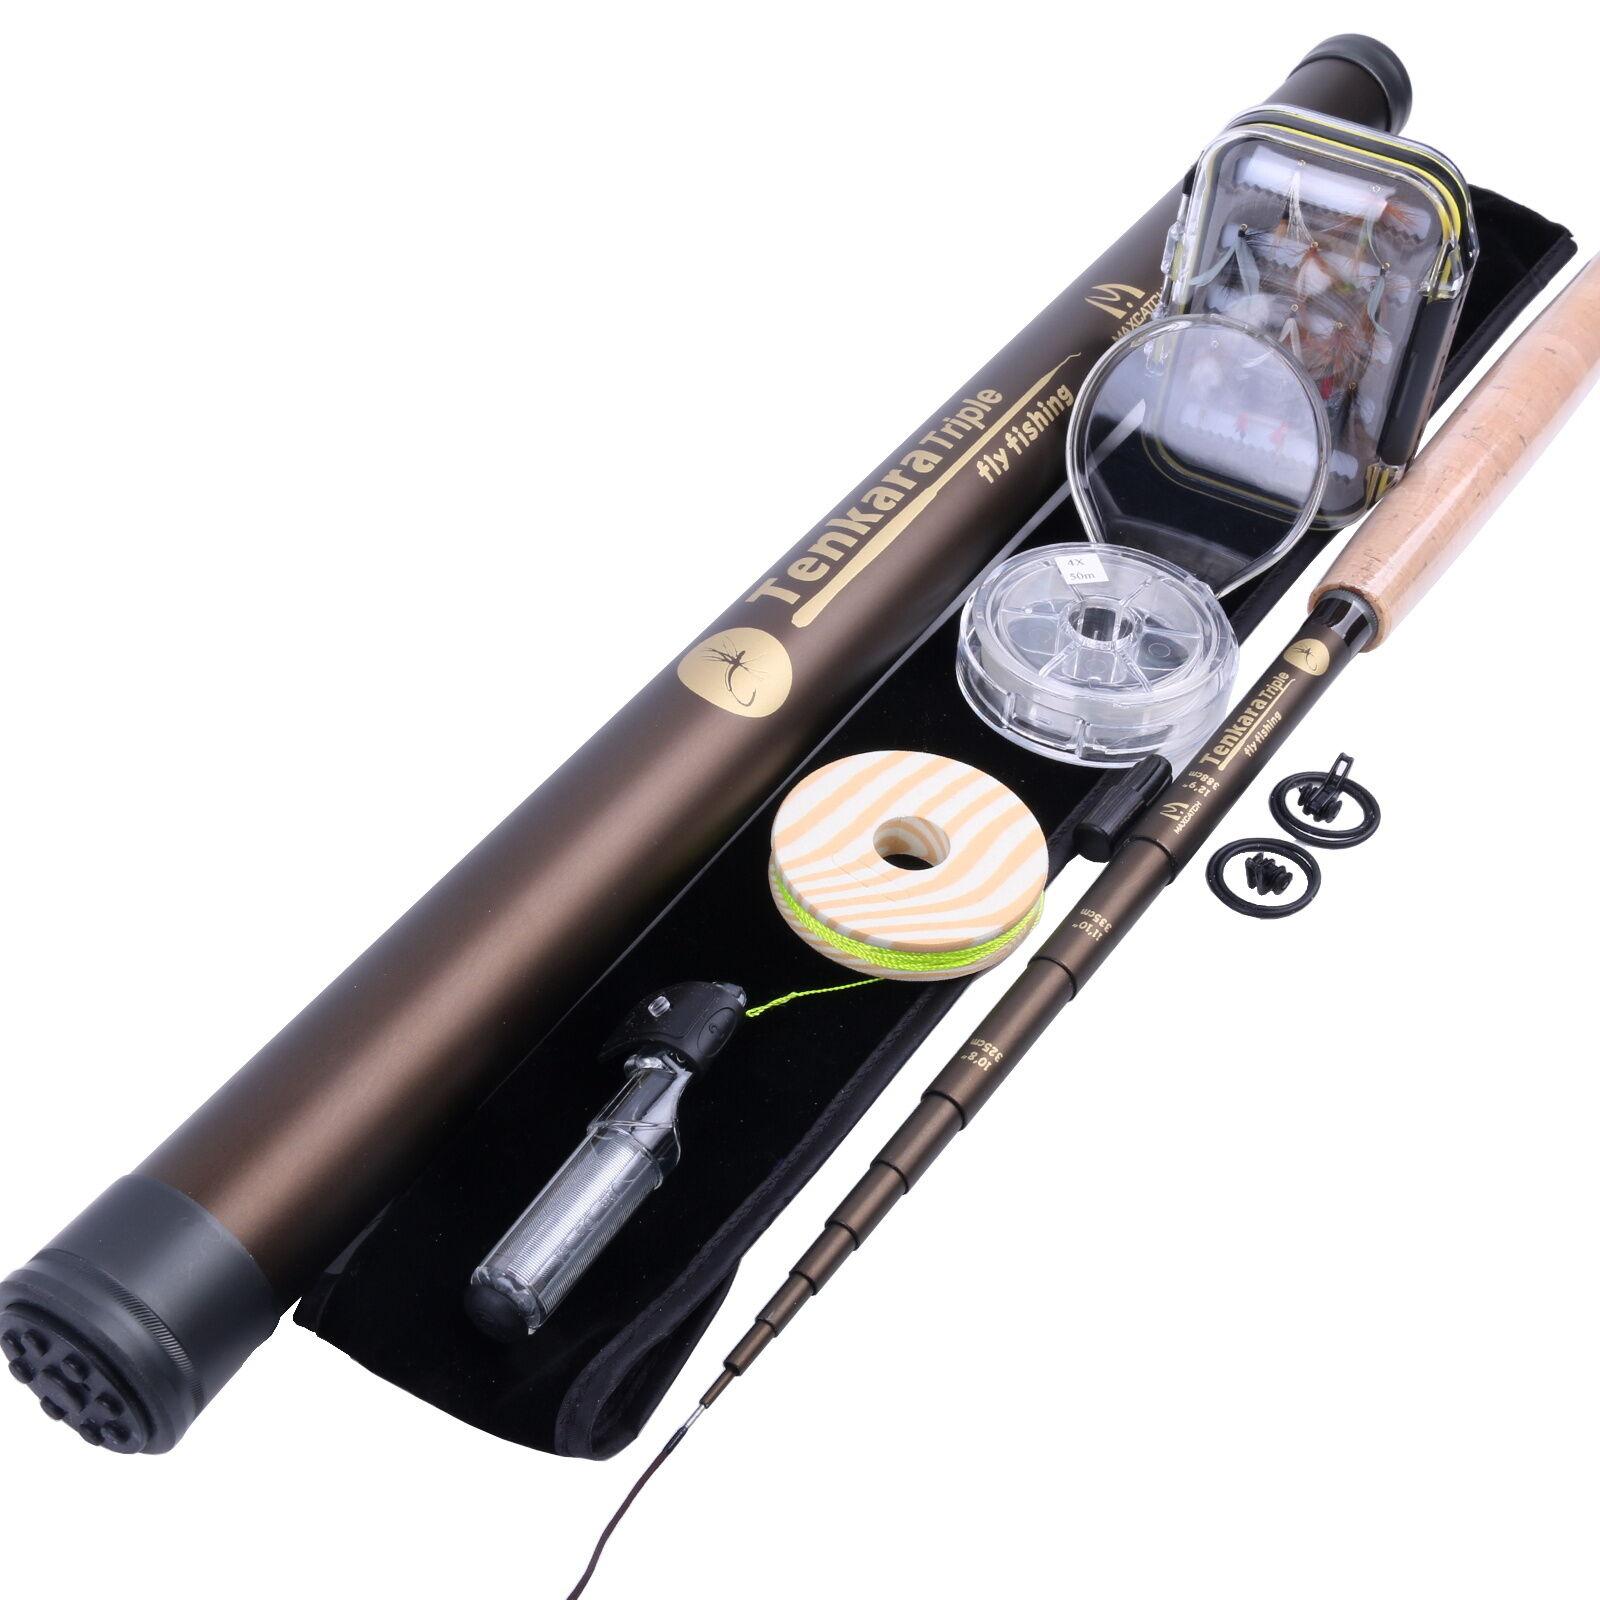 Telescoping Tenkara Rod Combo 10'8  11'1  12'9  Fly Fishing Pole & Line & Flies